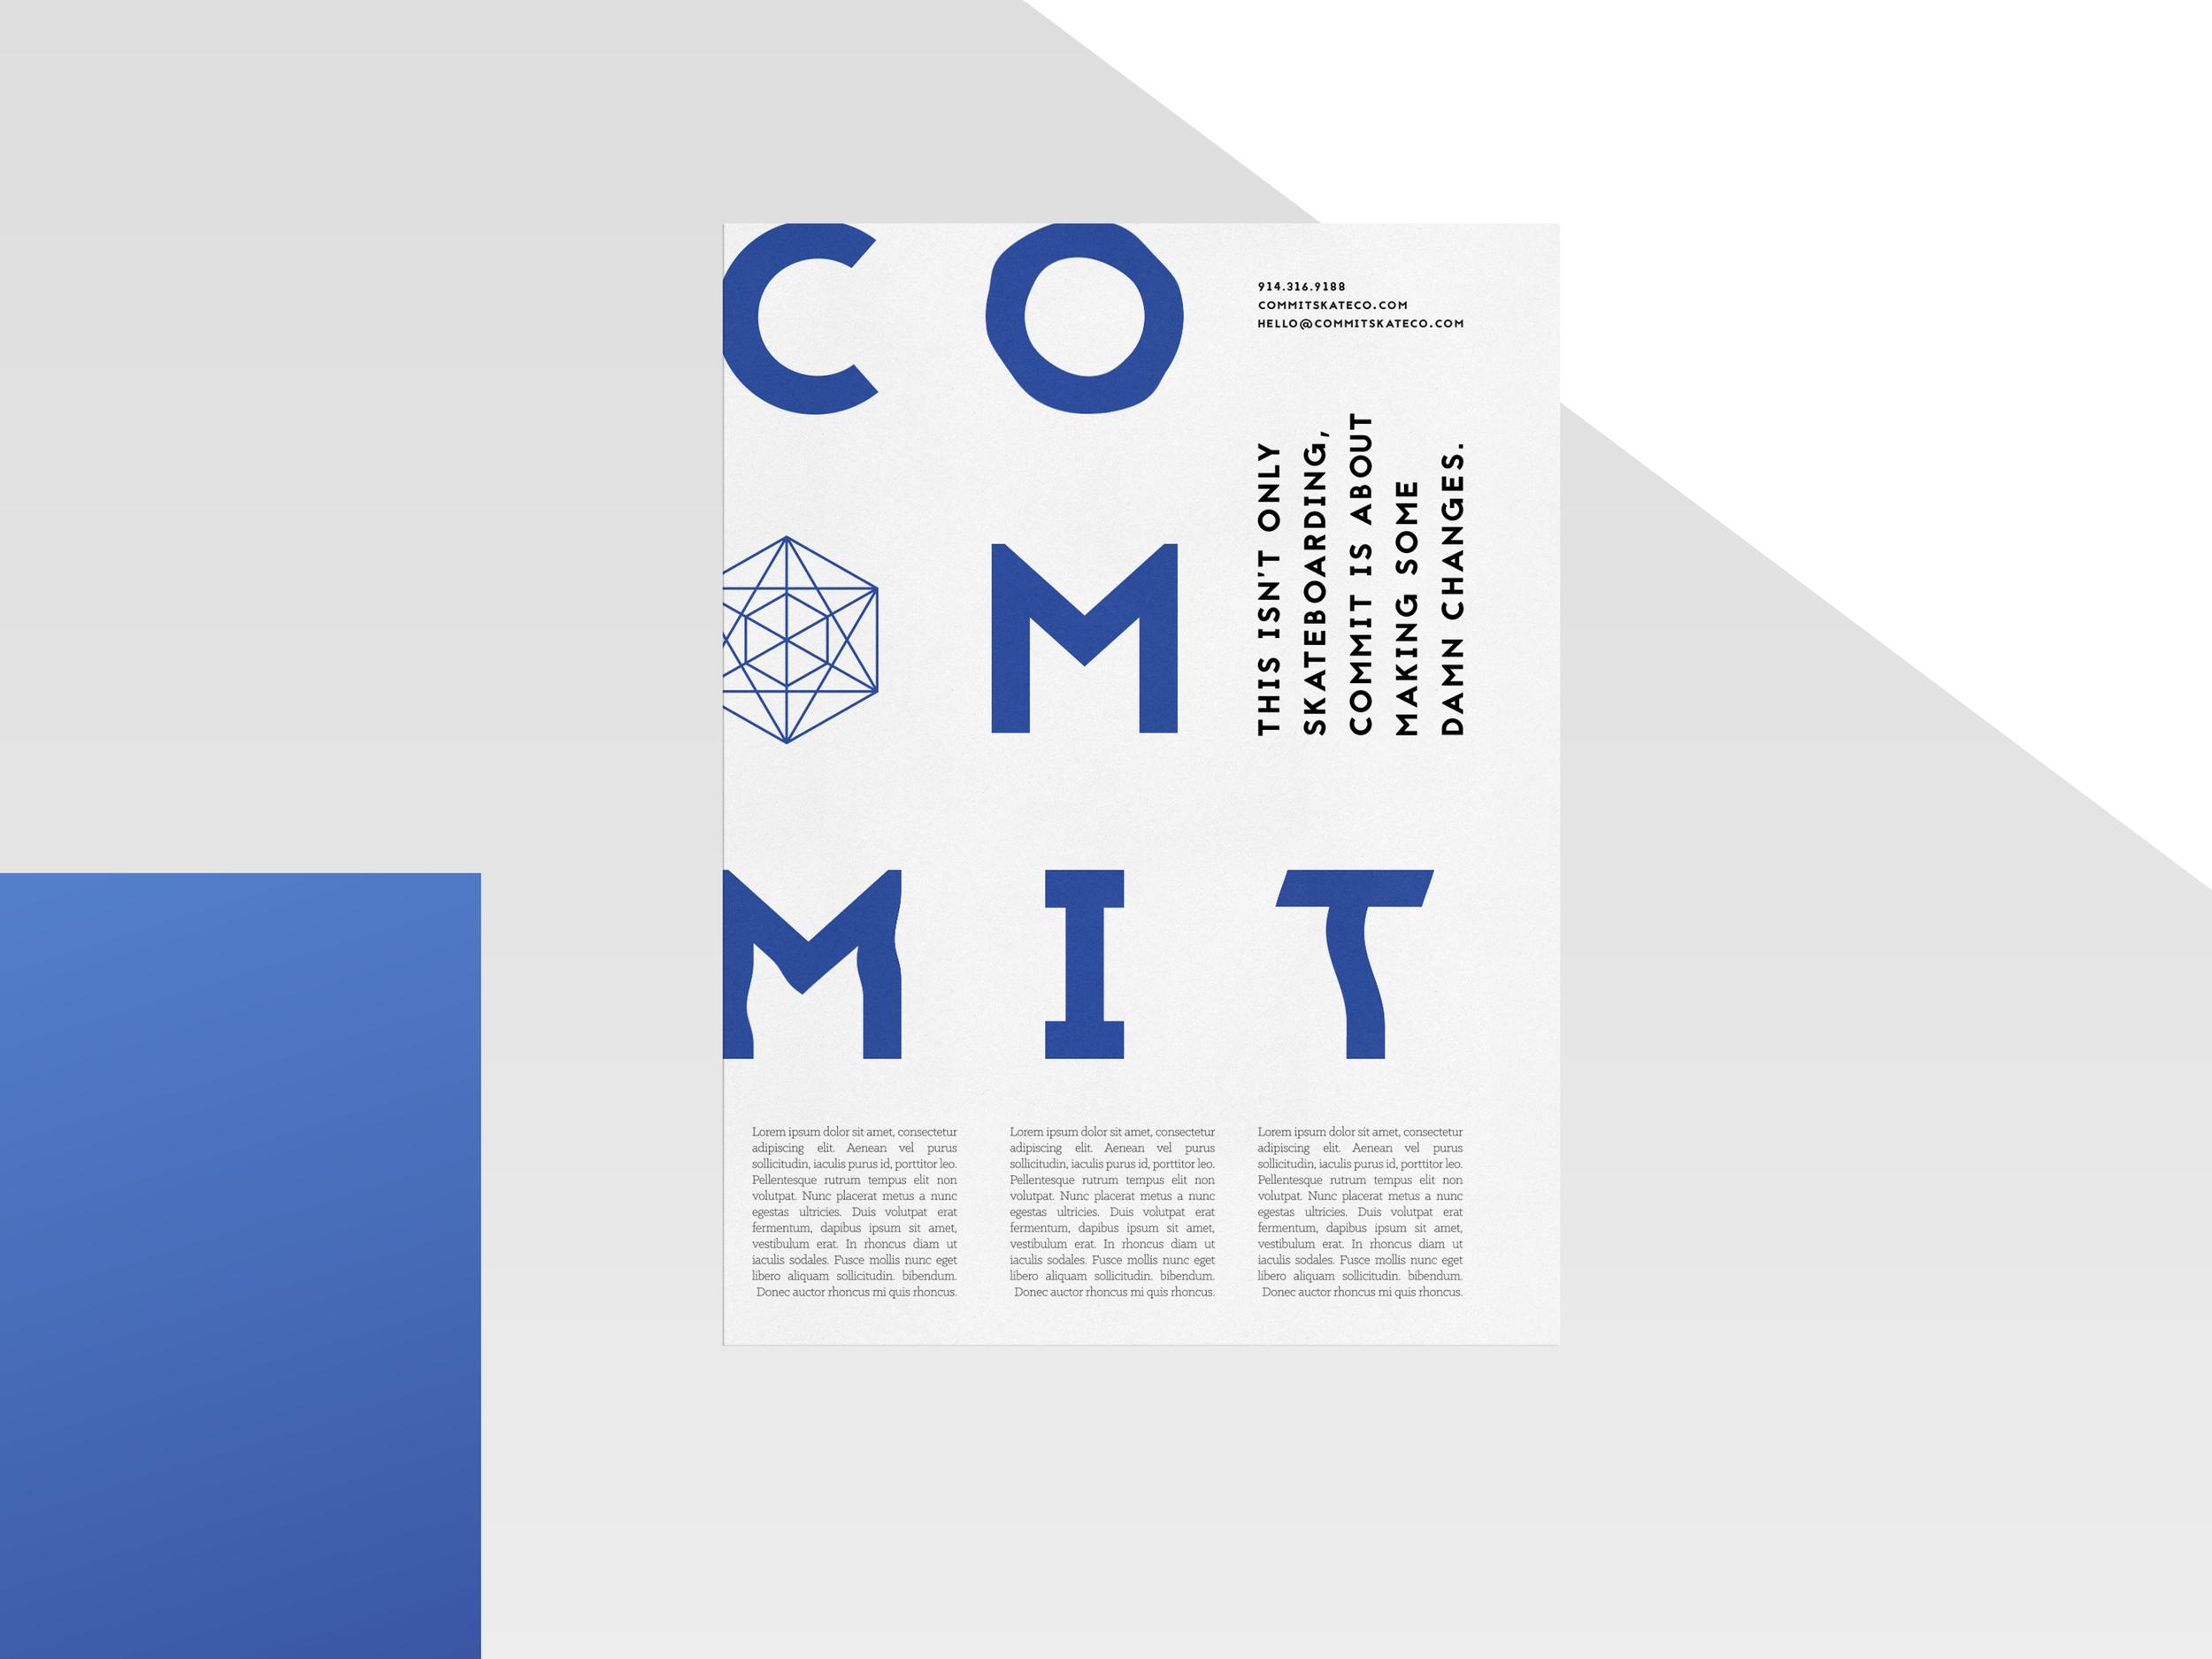 Studio_Bloq-Commit_Skate_Co-6.jpg